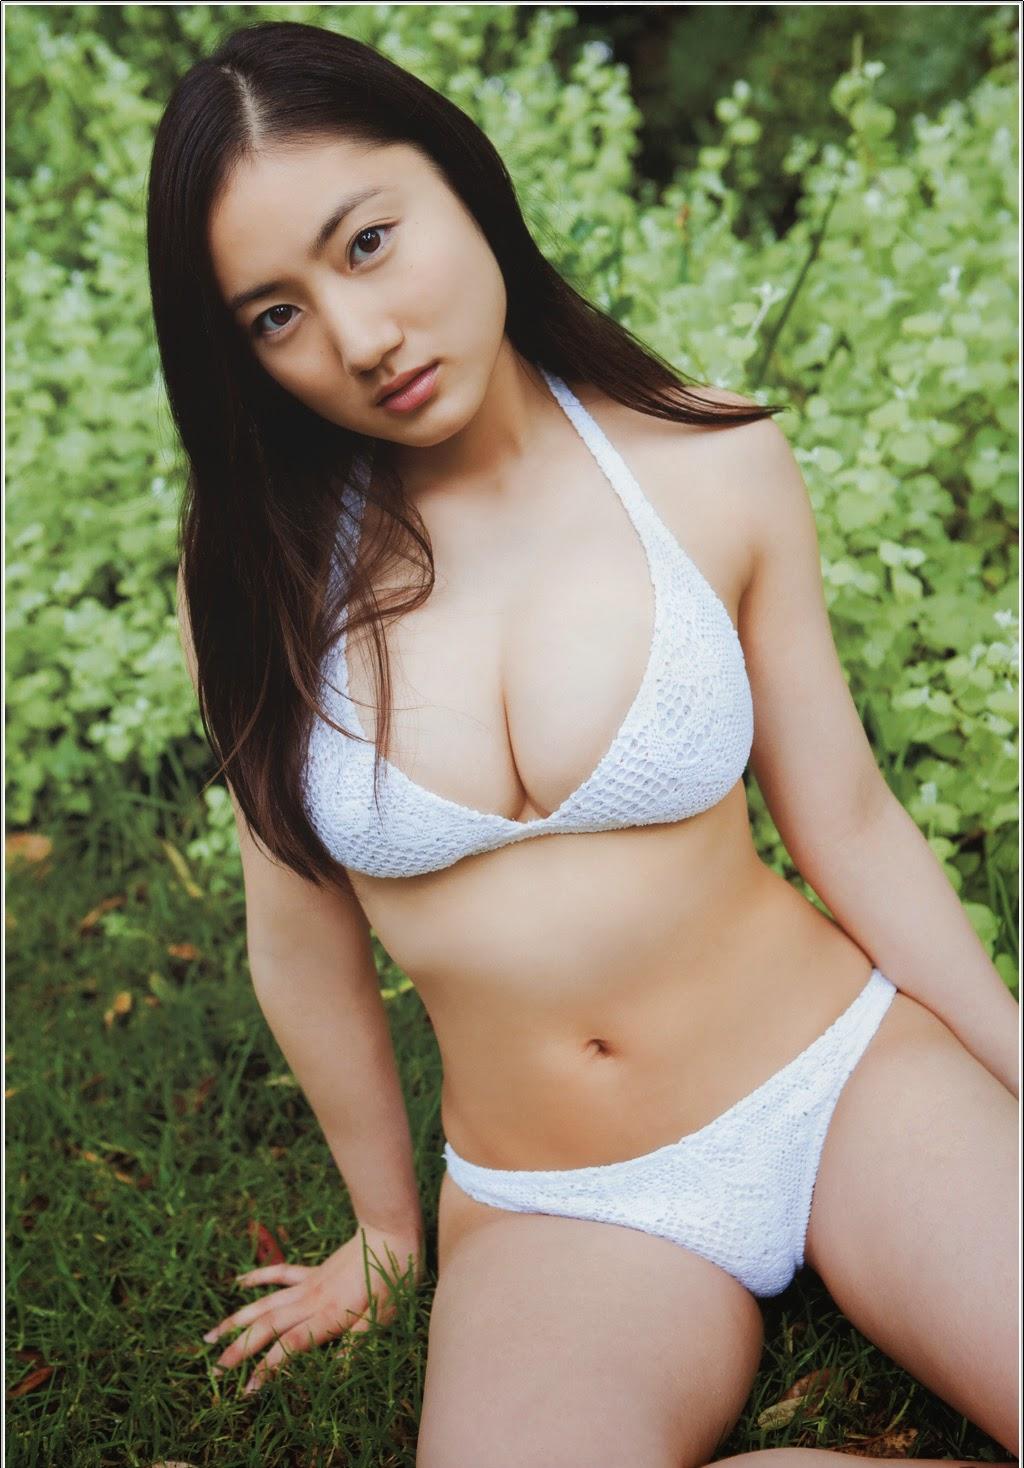 xvideos suzuki saaya @photos  Saaya Suzuki Xvideos @自撮りphotos 2 